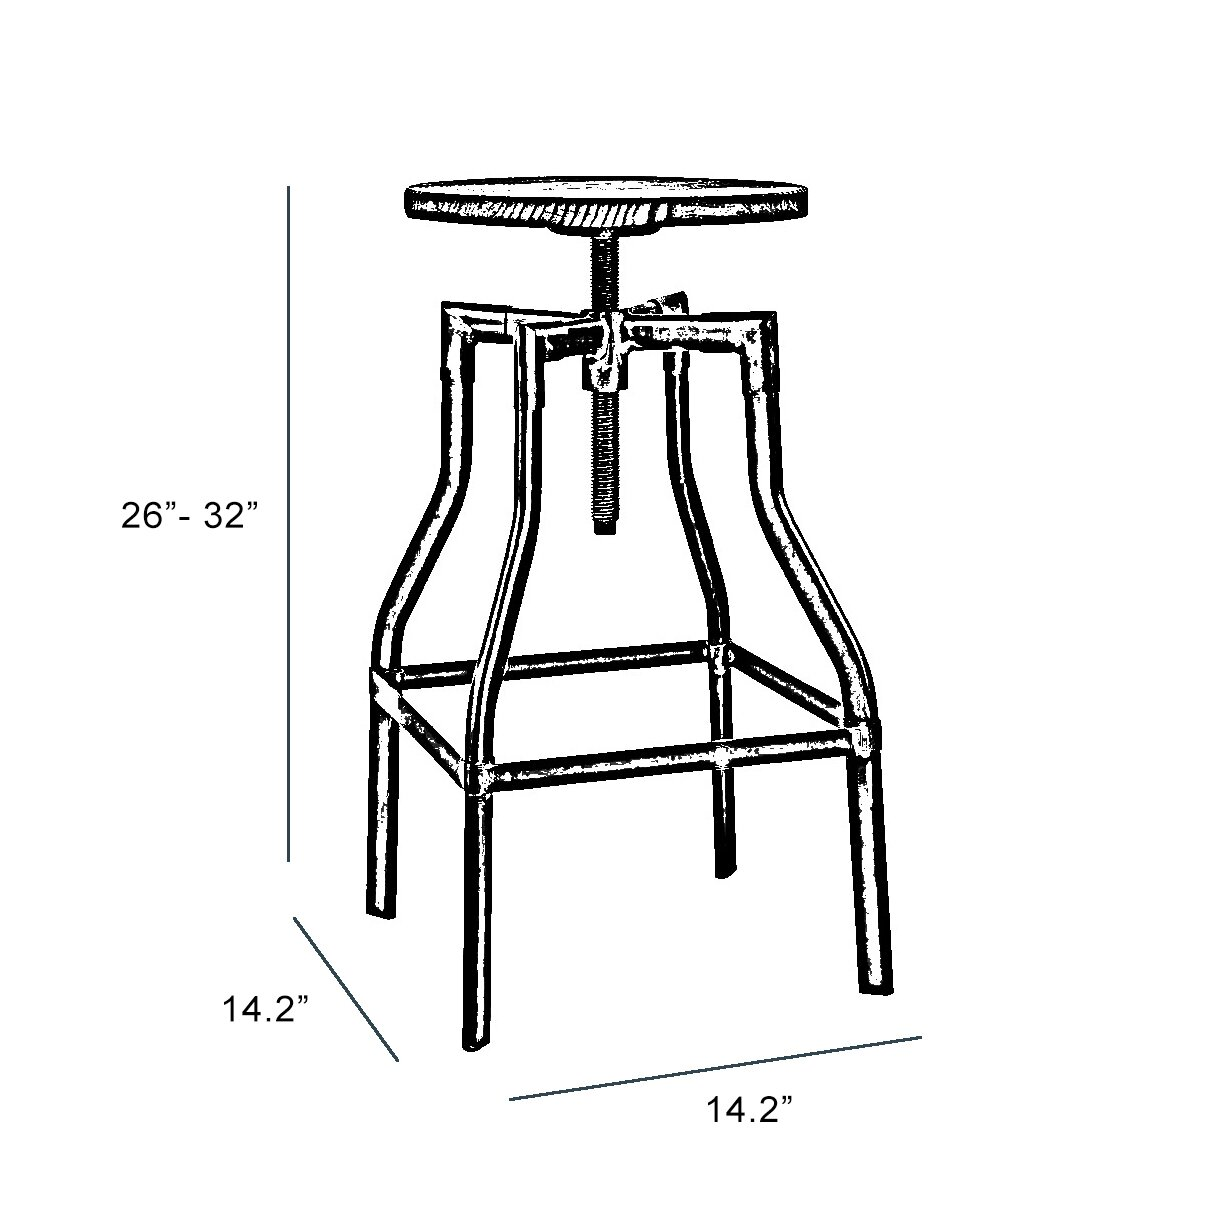 Design Lab MN Machinist Adjustable Height Swivel Bar Stool  : Design Lab MN Machinist Adjustable Height Swivel Bar Stool from www.wayfair.com size 1216 x 1216 jpeg 129kB